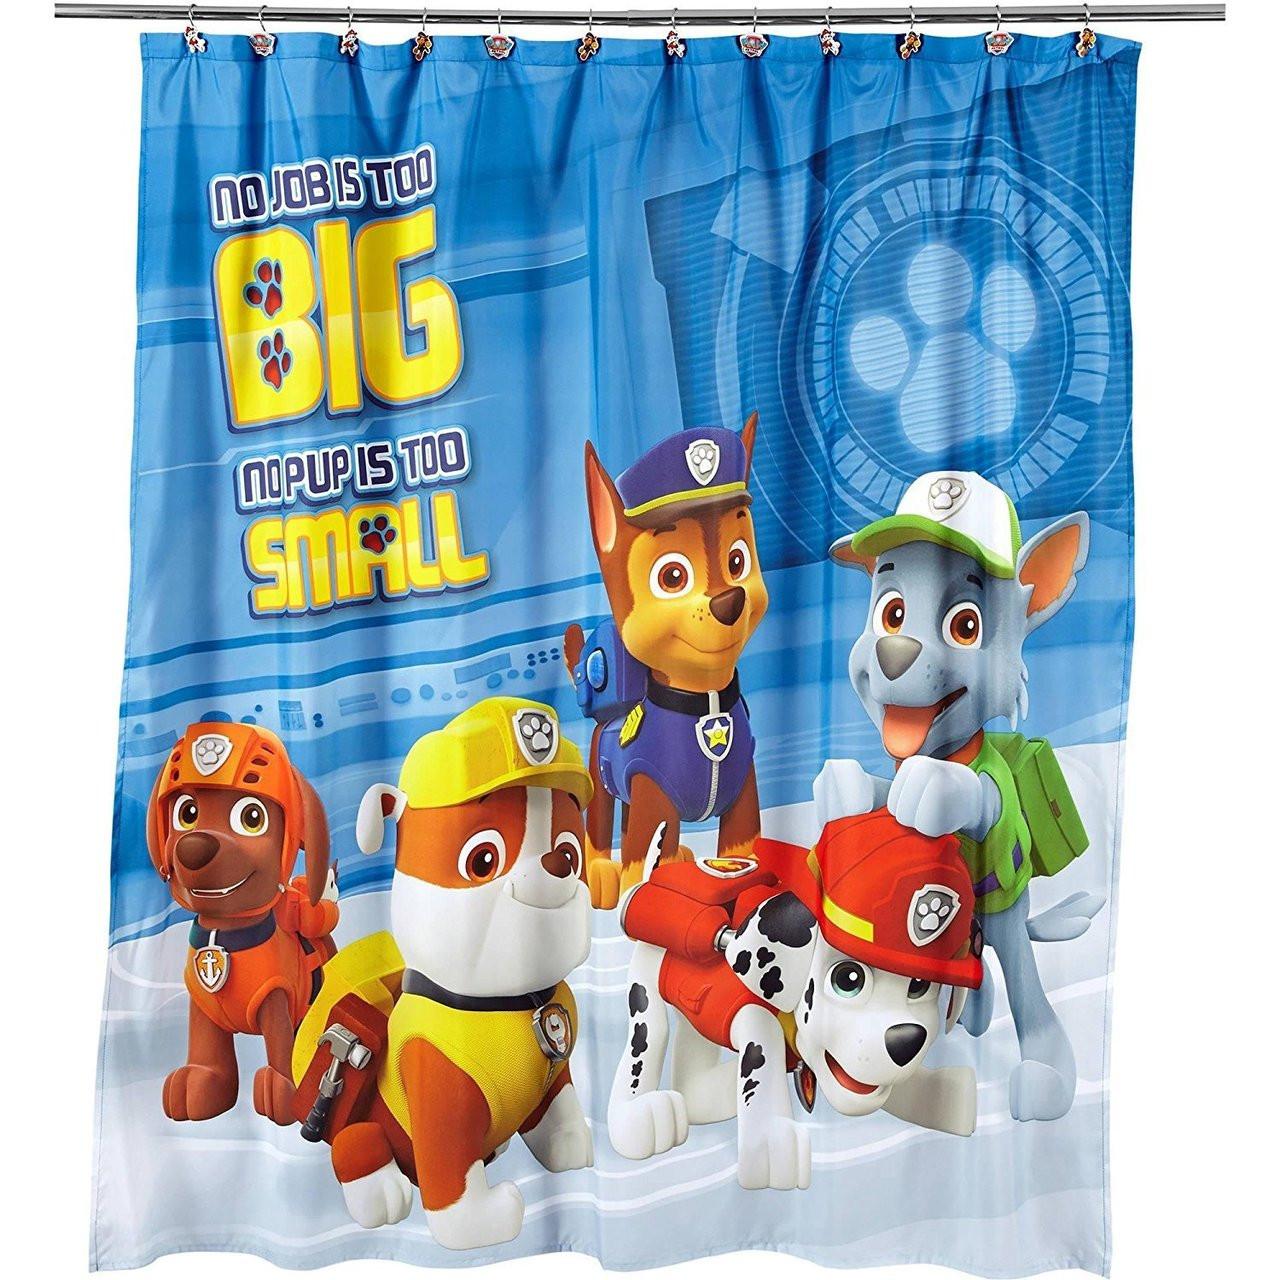 Paw Patrol Fabric Shower Curtain Rescue Crew